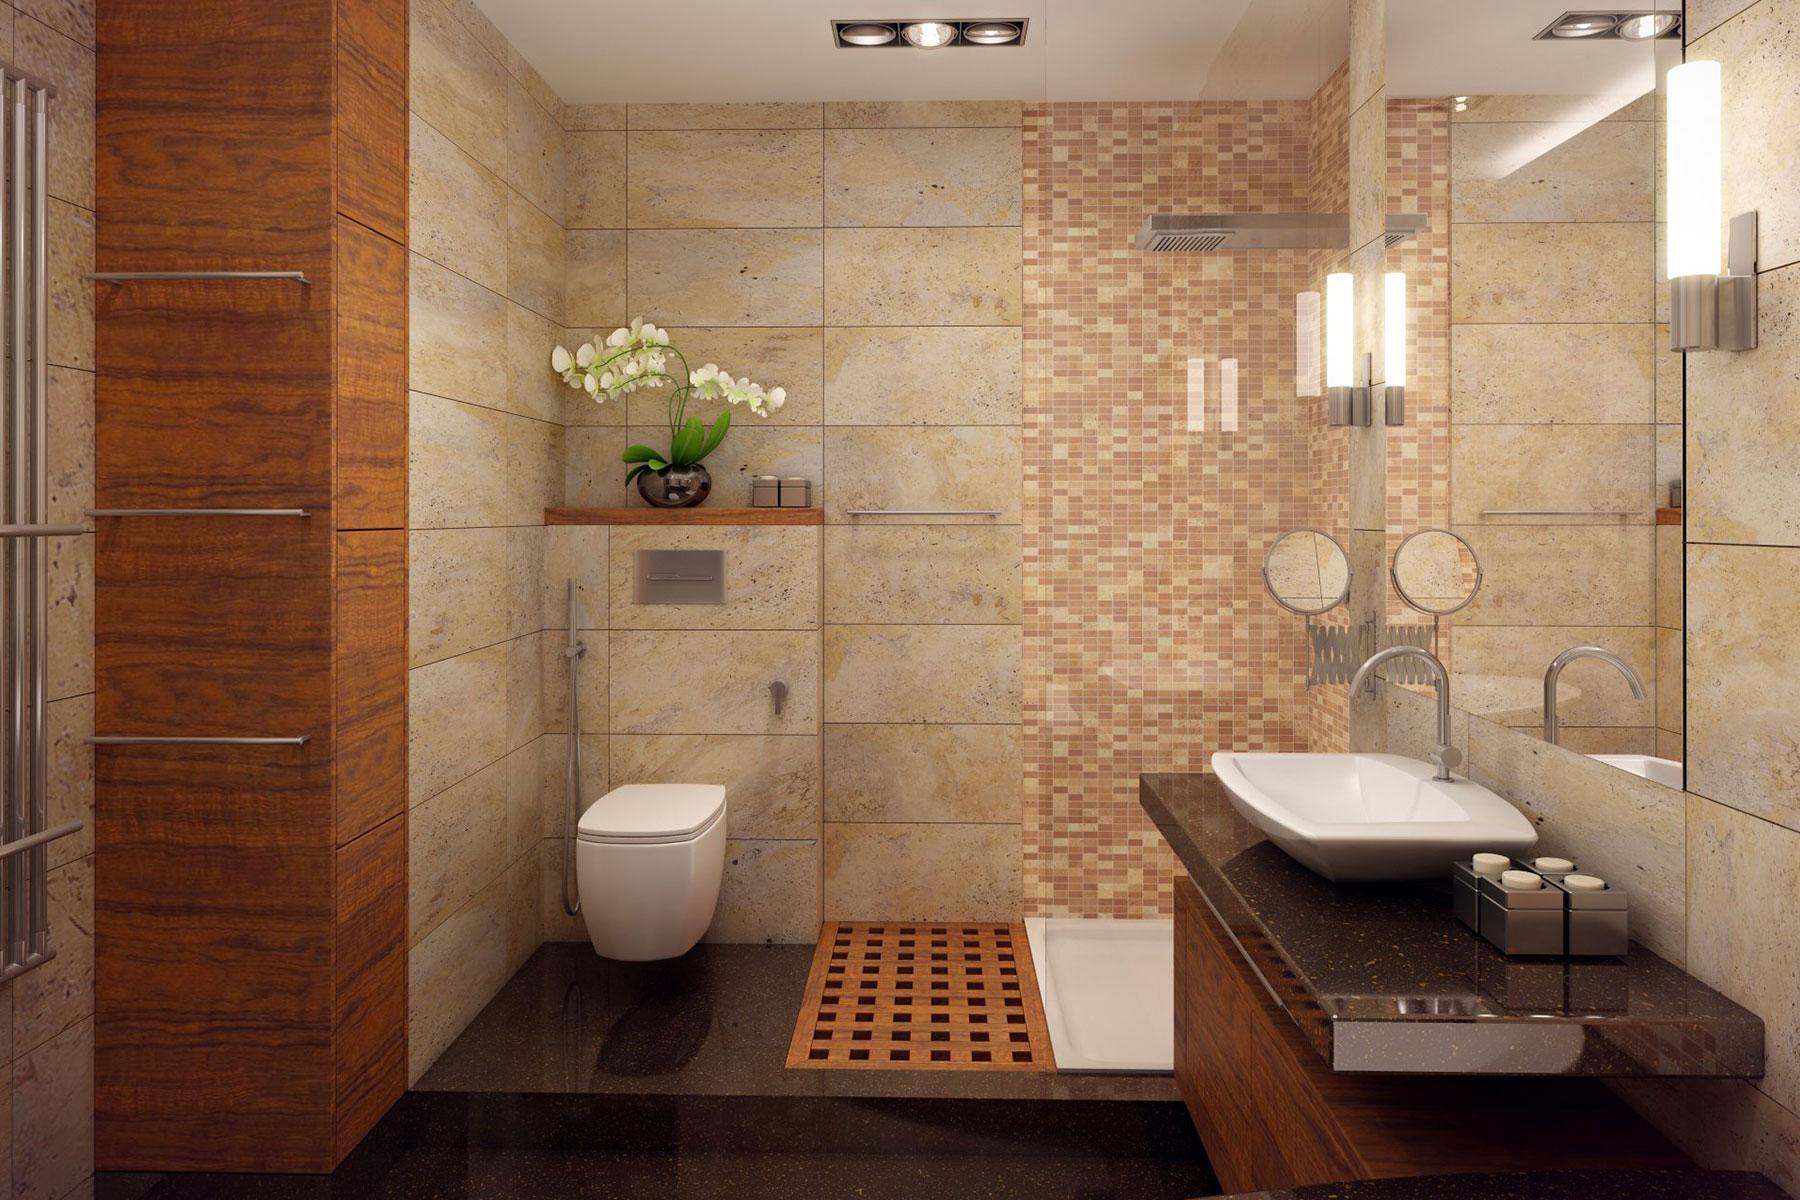 renovation-salle-de-bain-dallage-lens-lille-valenciennes-cambrai-saint-quentin-arras-douai